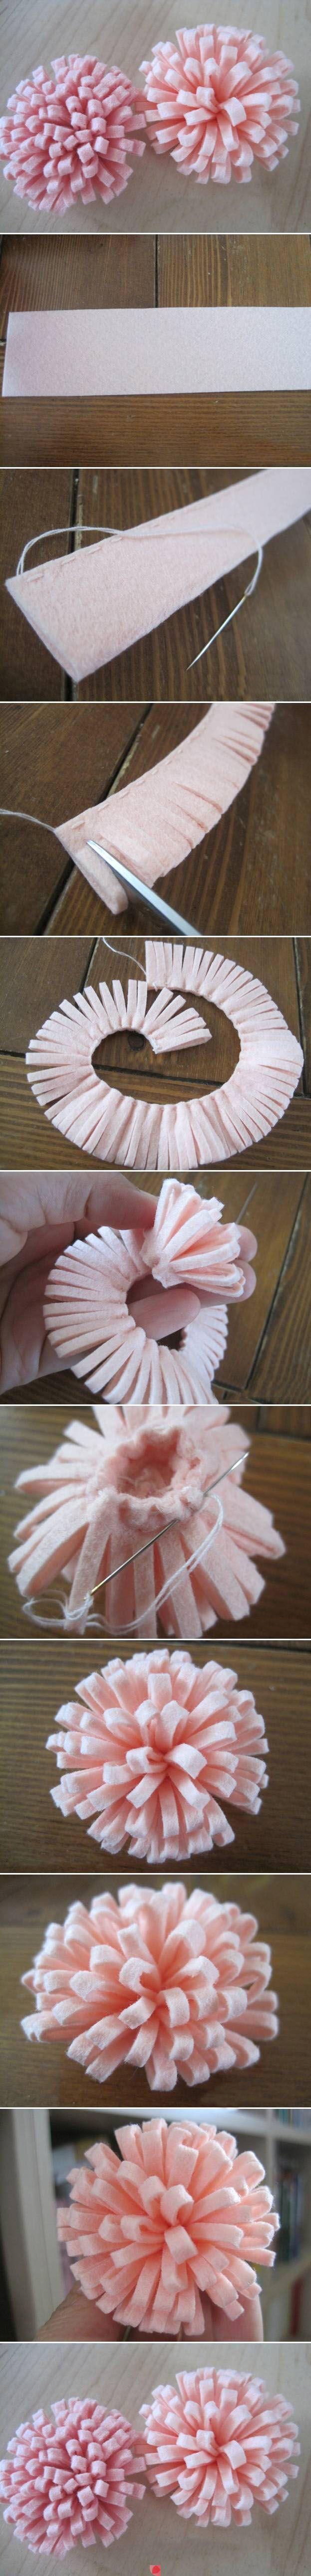 Best 20 Fabric flowers ideas on Pinterest